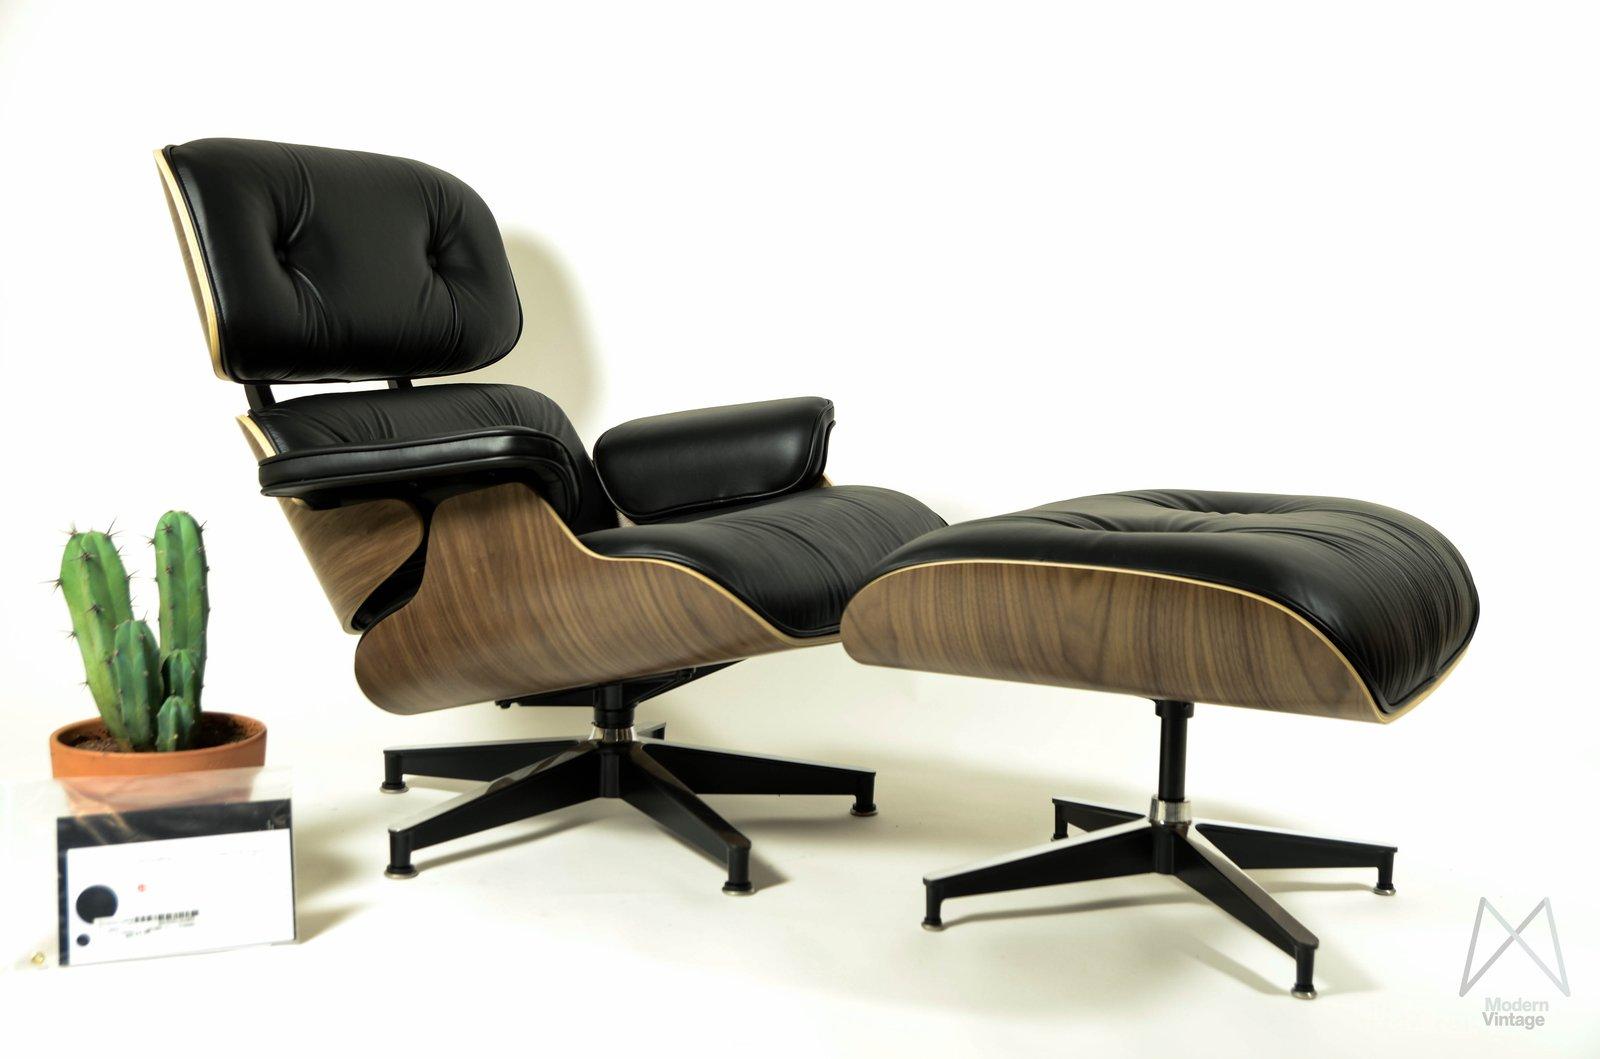 Eames Lounge Chair Original modern vintage amsterdam original eames furniture lounge chairs